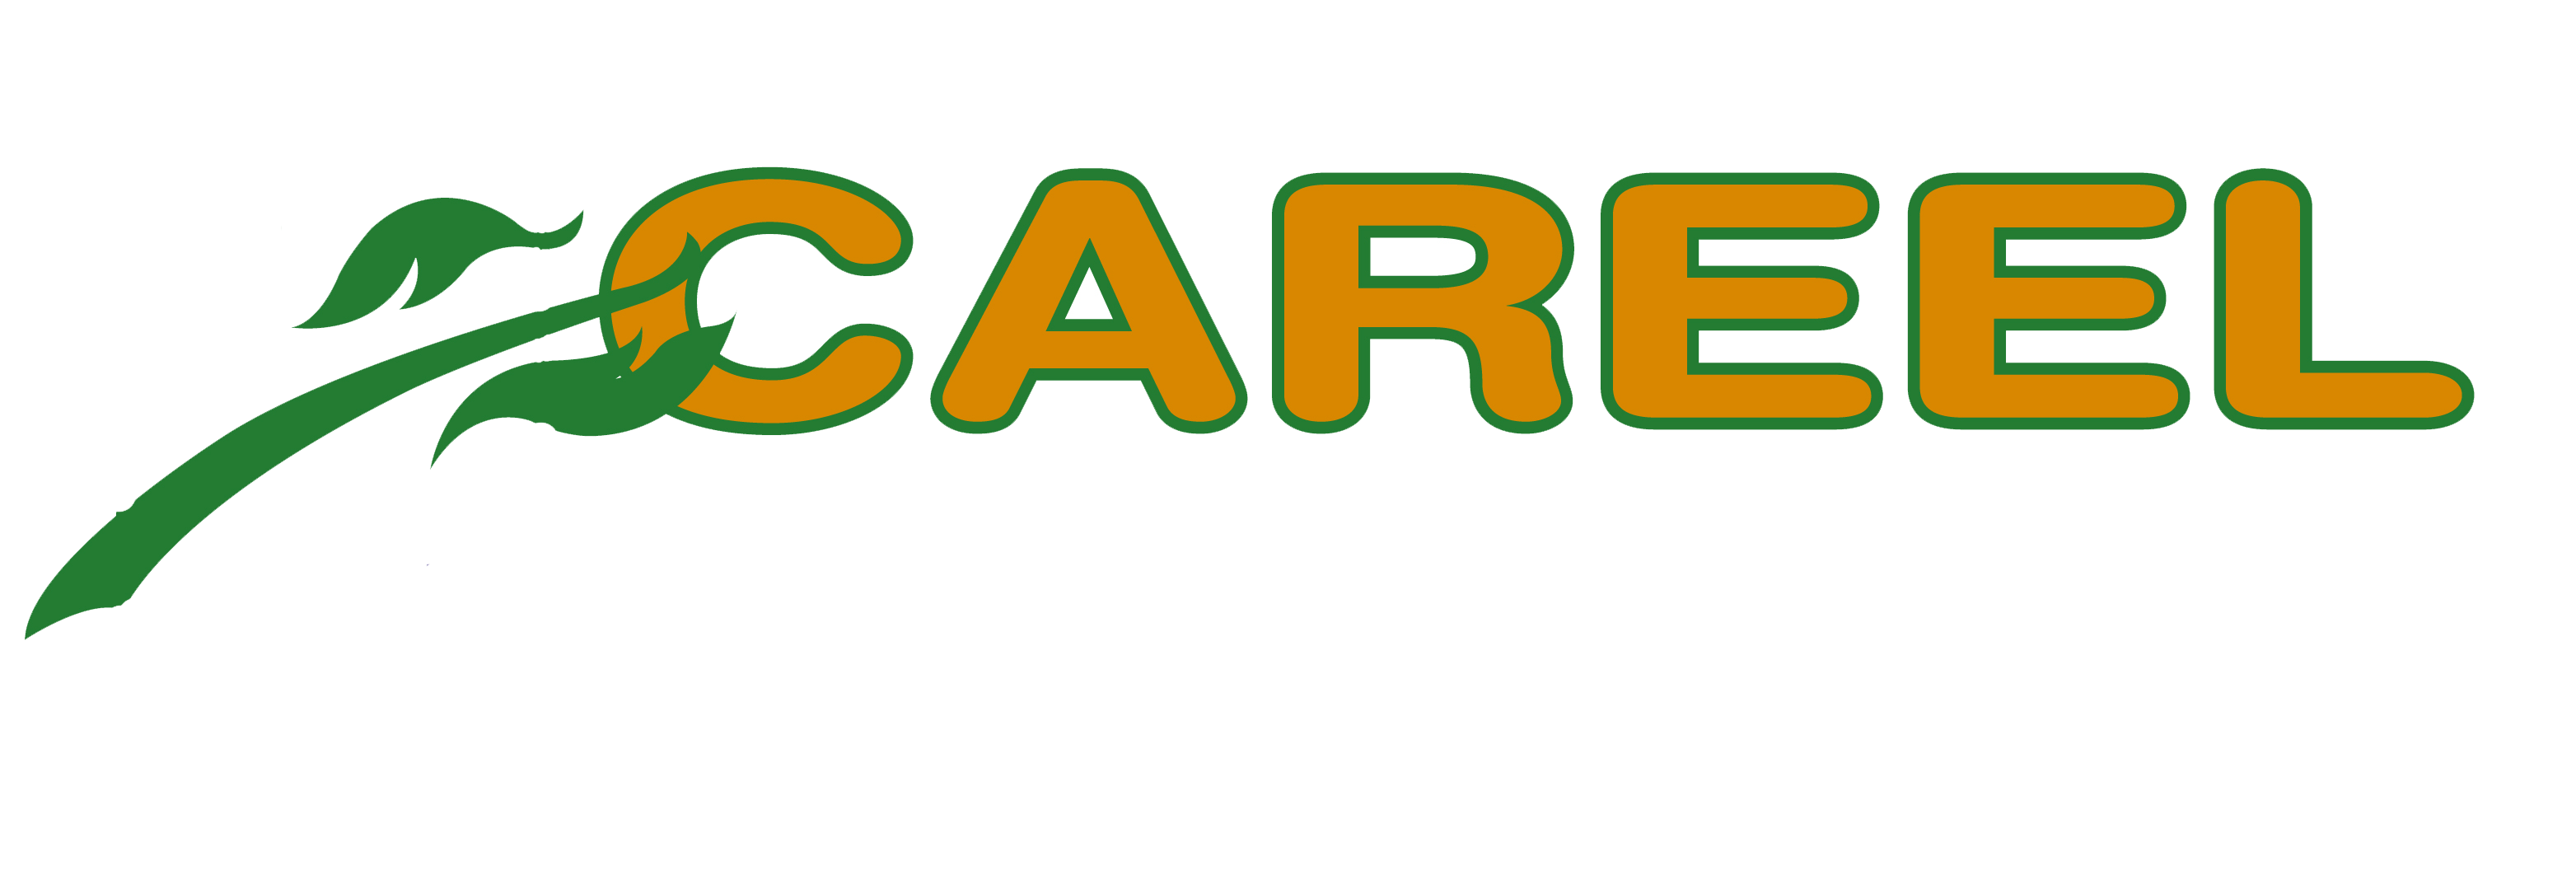 Careel